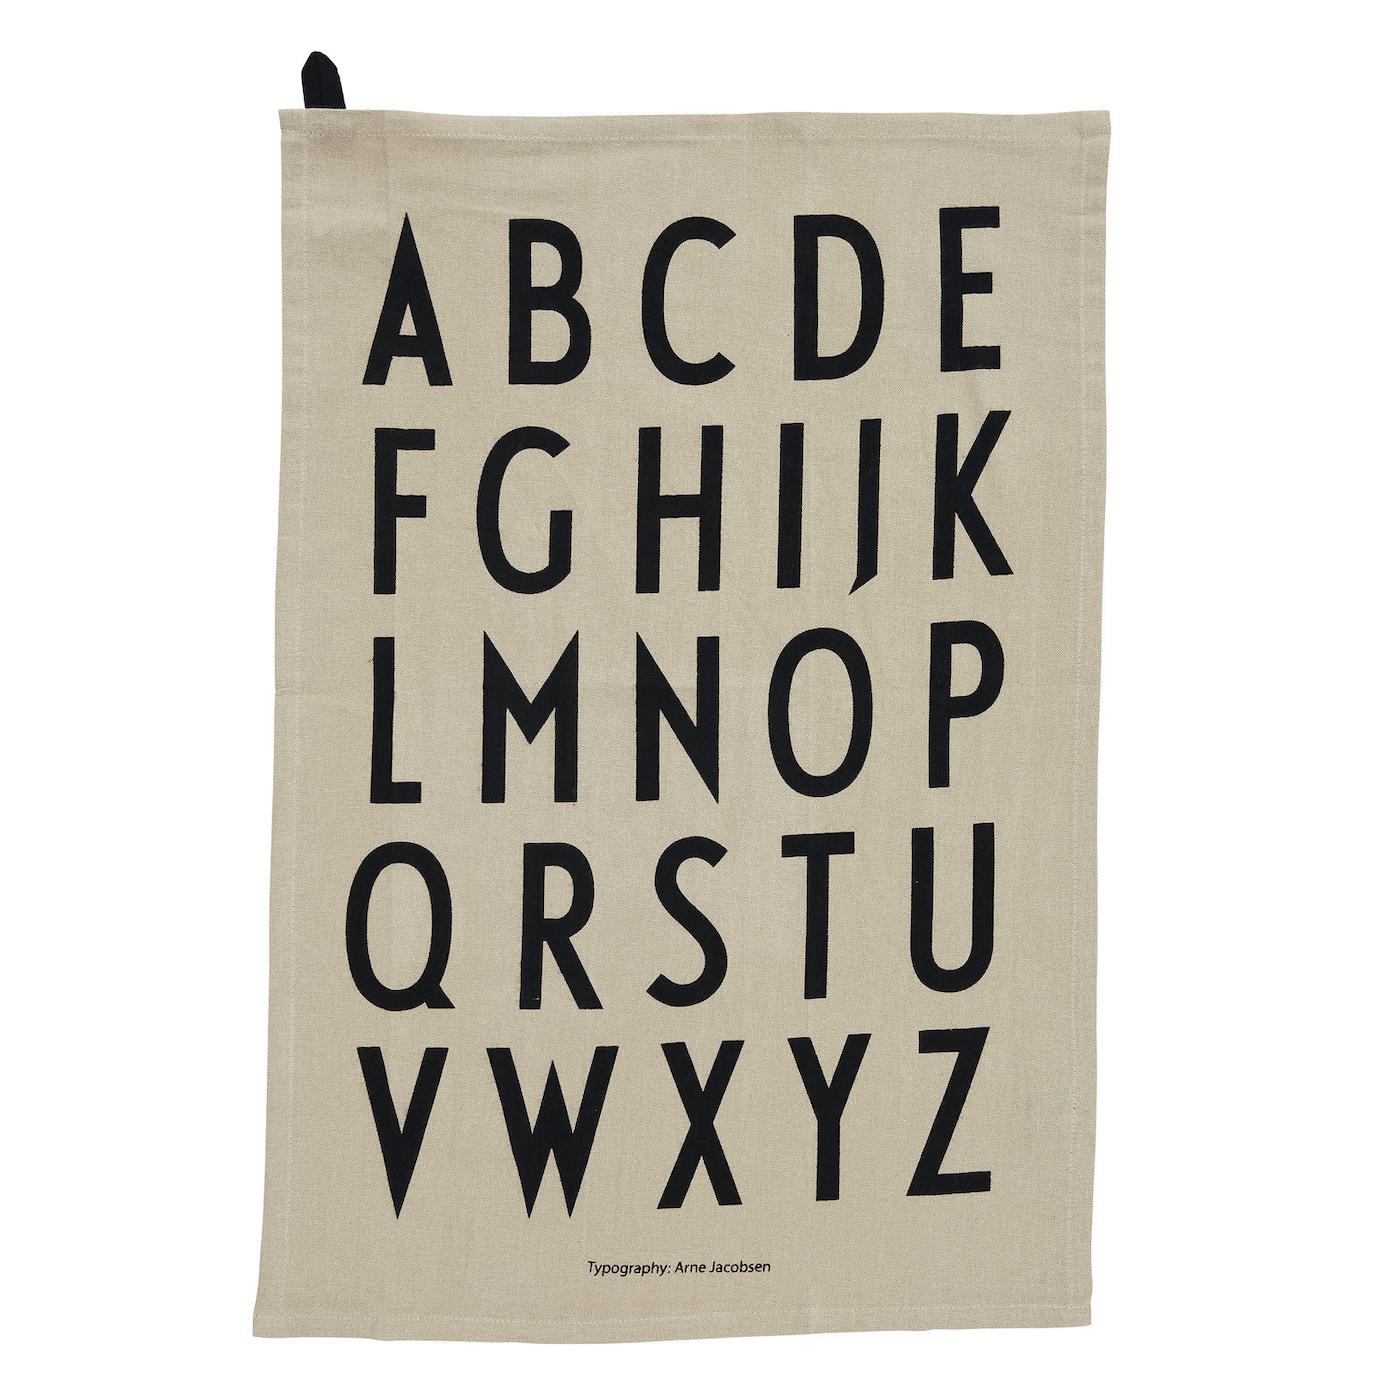 Hygge Handtuch, Hygge Becher, Arne Jacobsen, Design Letters , Neuheiten 2020, Dänemark